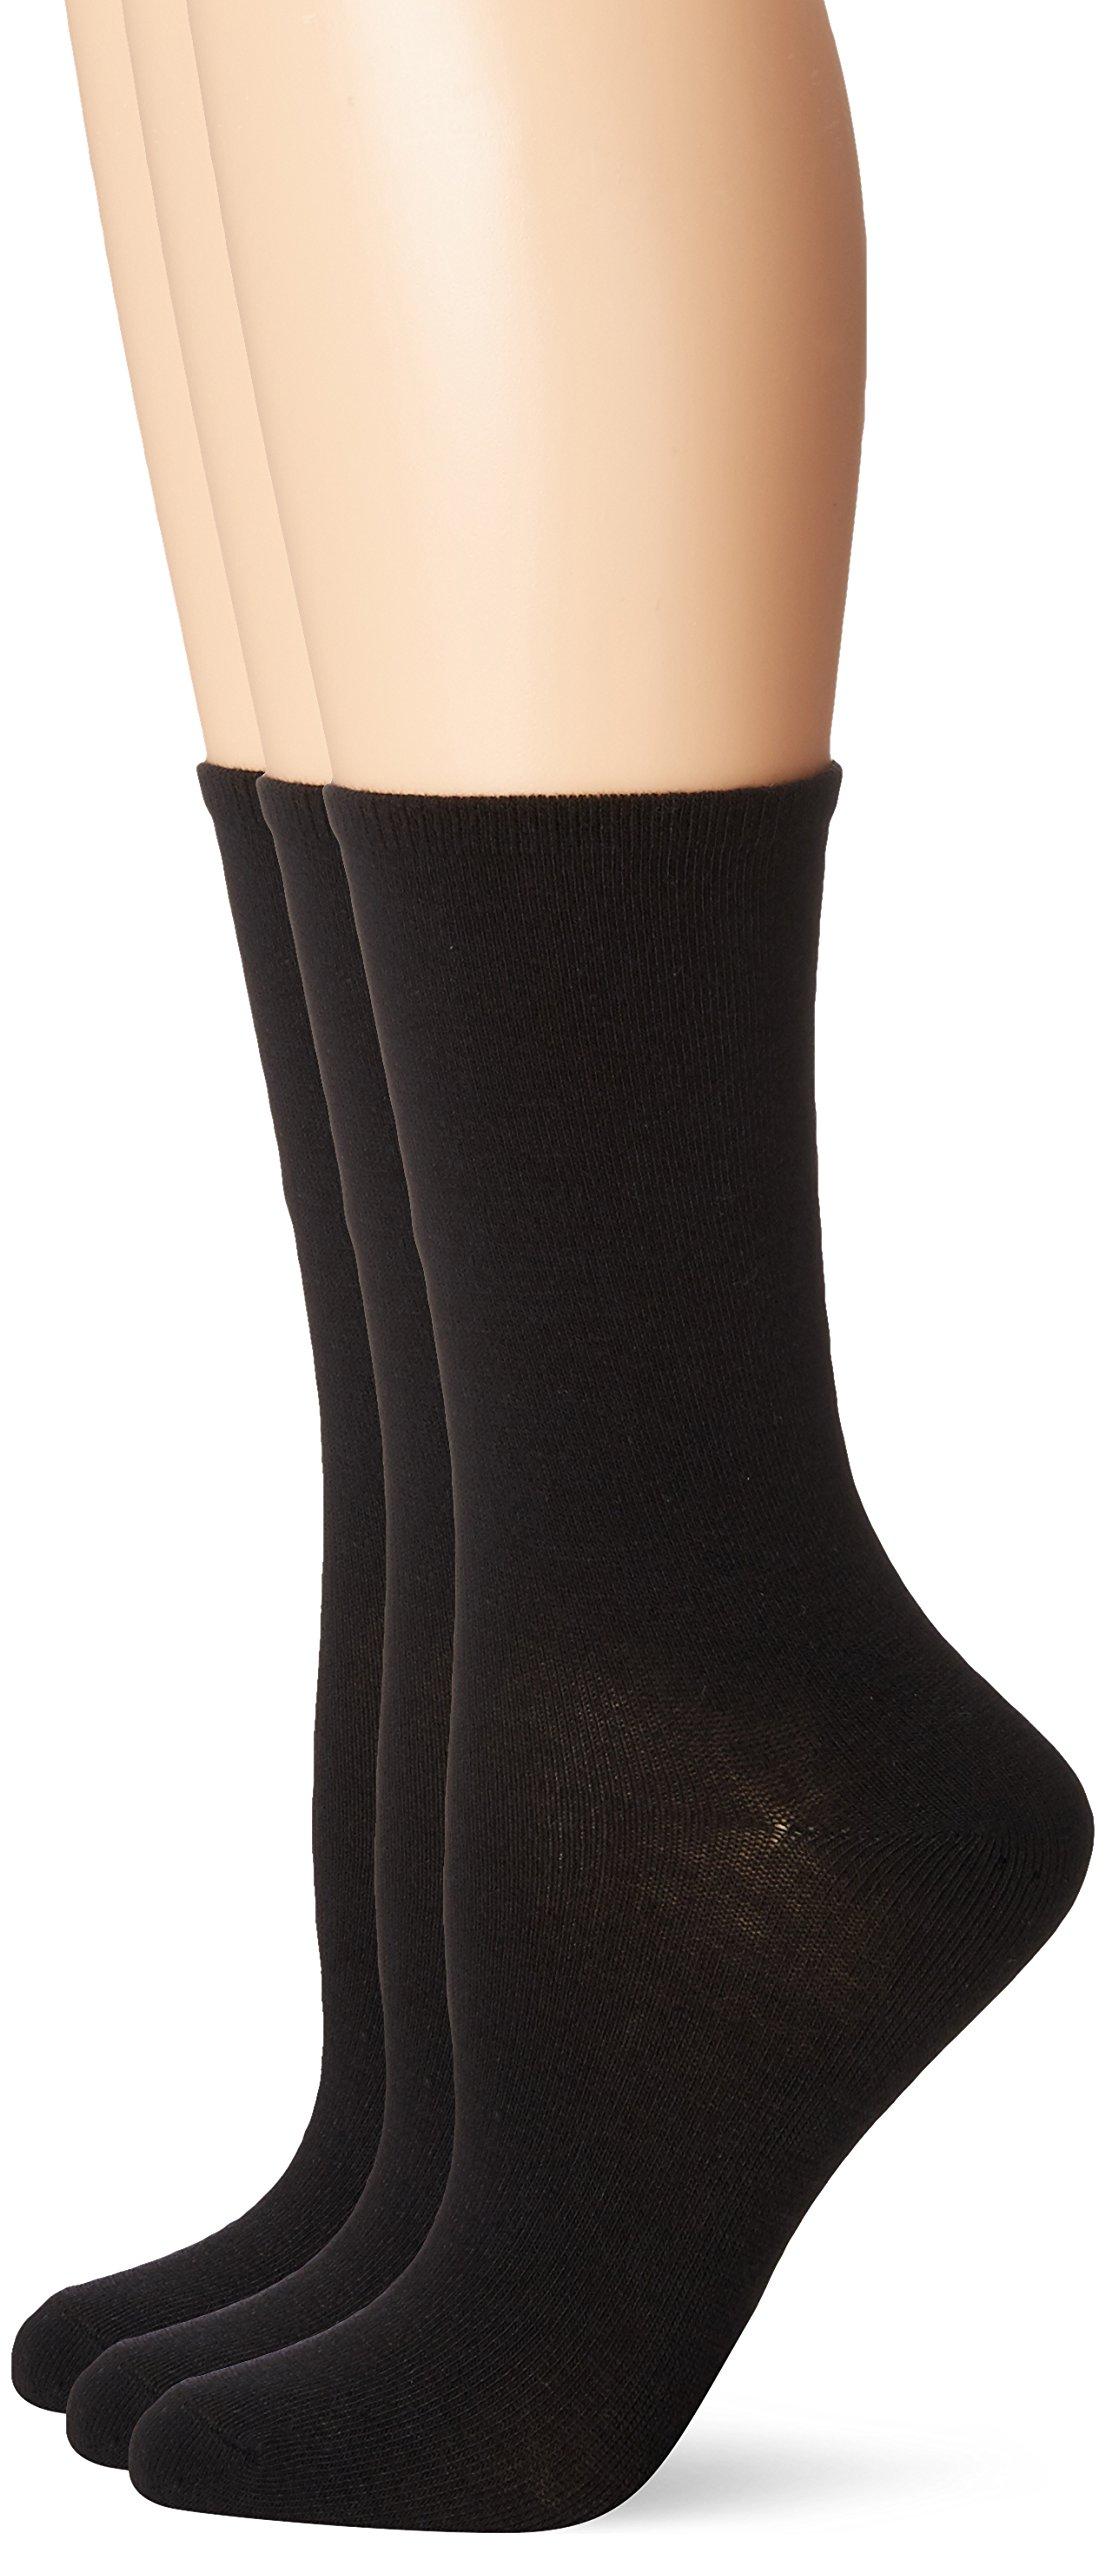 No Nonsense Women's Flat Knit Crew Sock, 3 Pair Pack, Solid Black 4-10